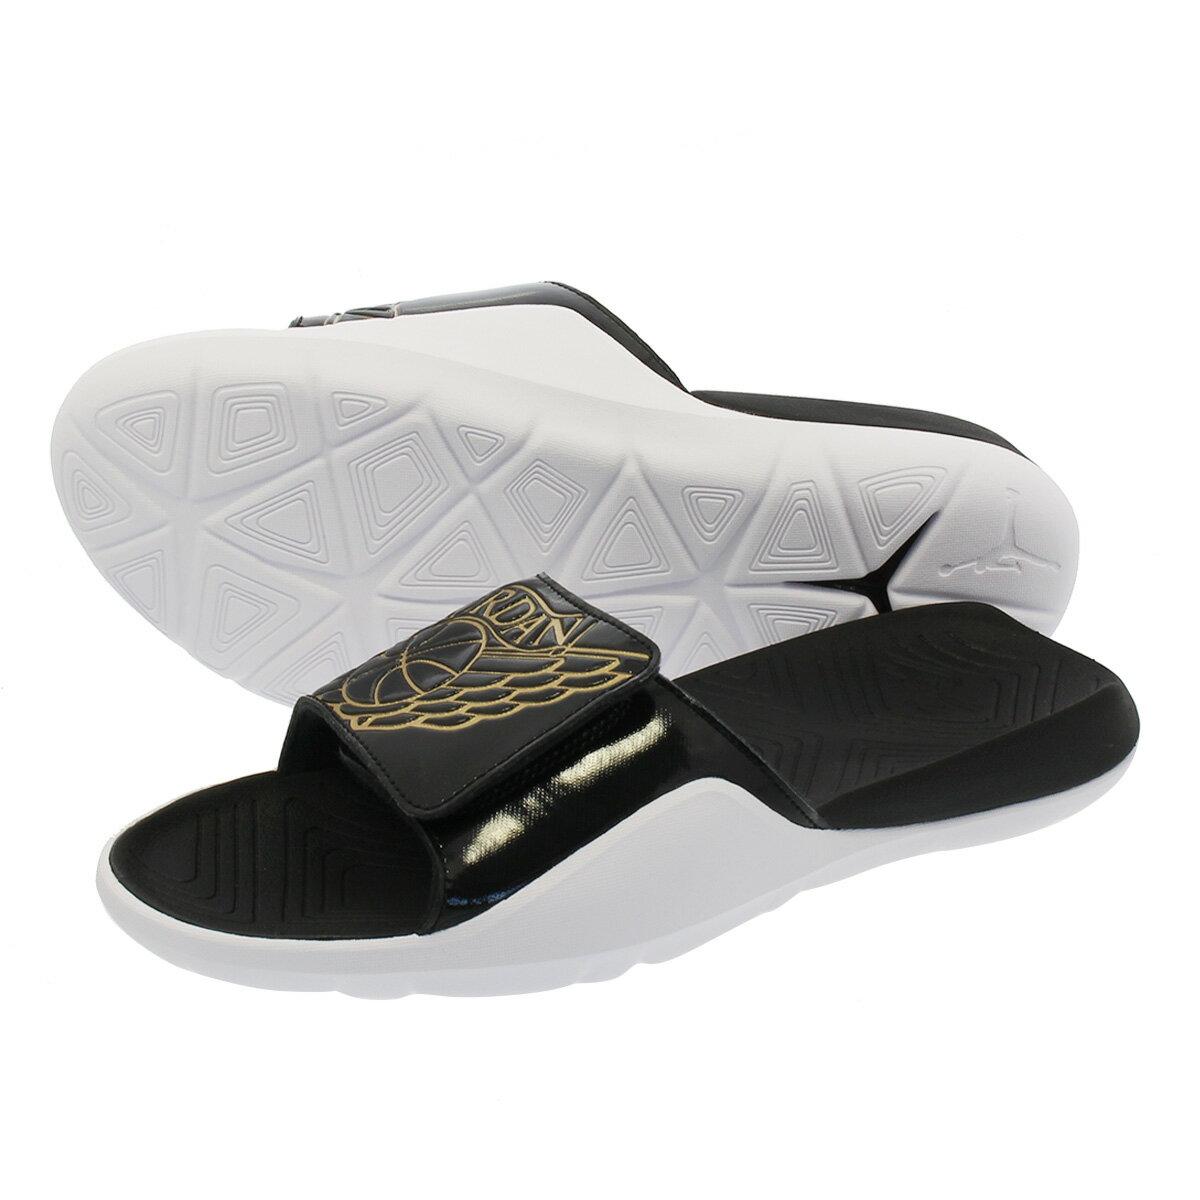 Nike Air Jordan Hydro 7 sandals Shoes AA2517-021 Jordan Hydro 7 Men s Slide  ... 74335d383